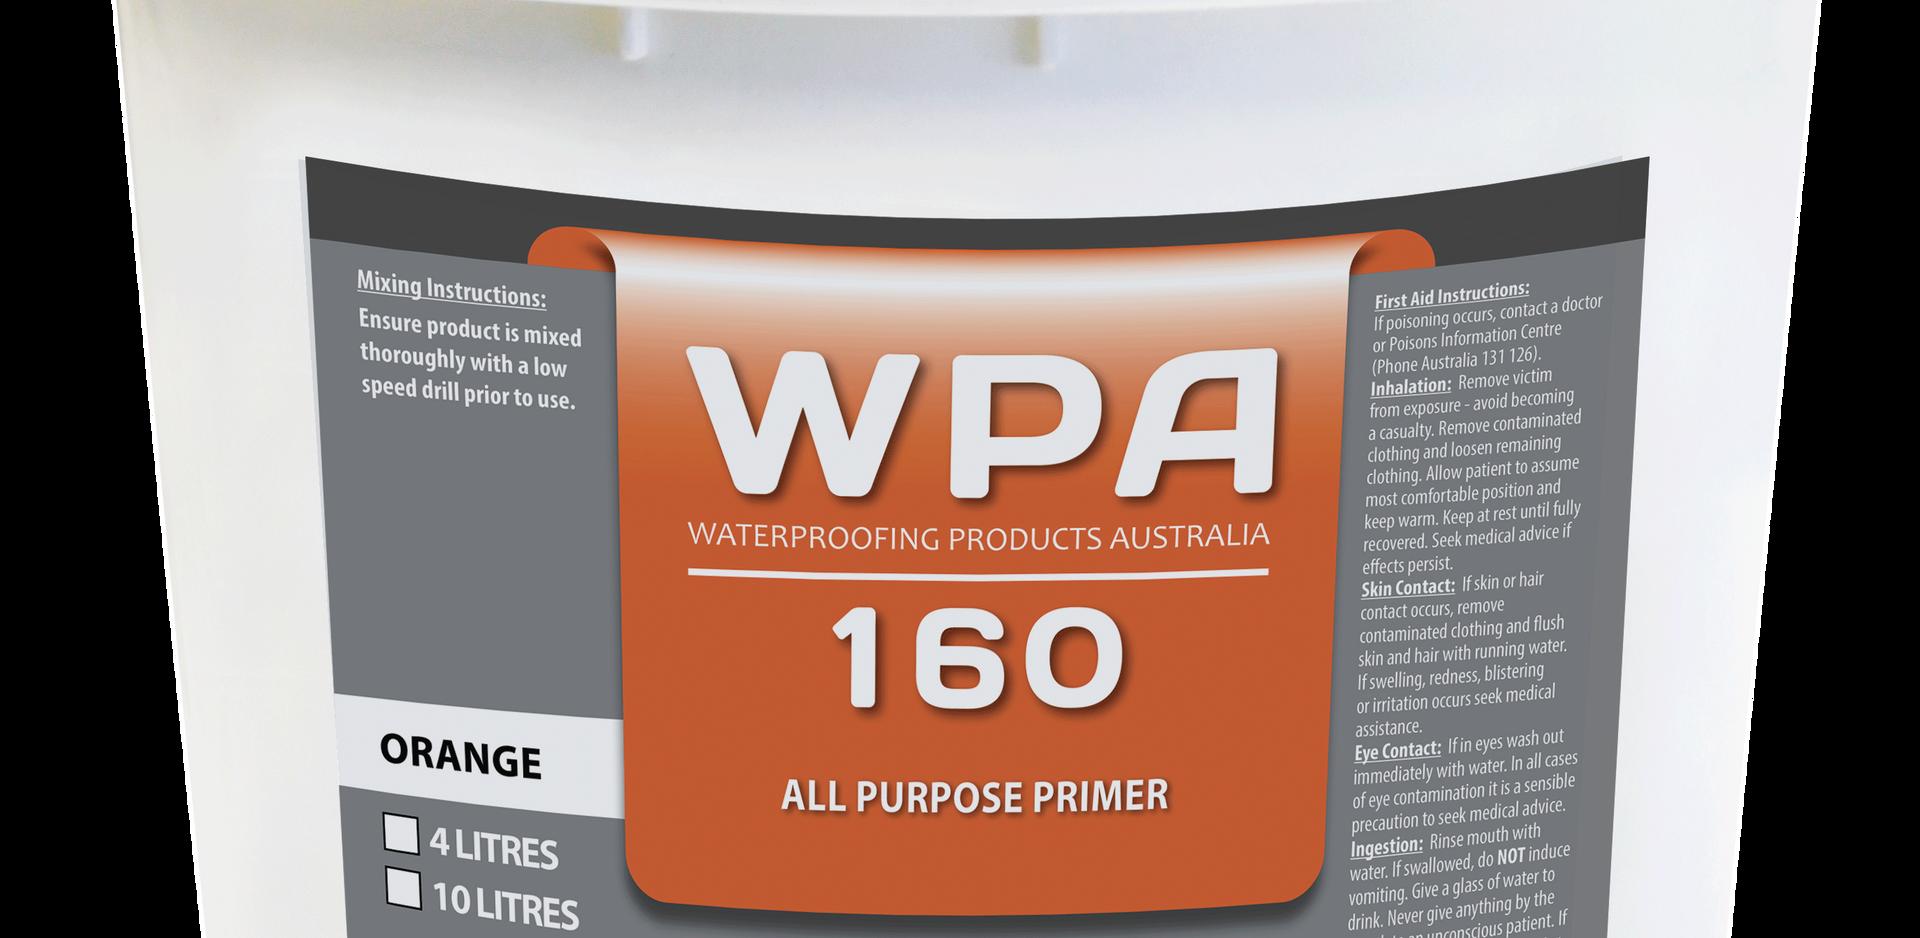 WPA-160-All-Purpose-Primer-10-Litre.png